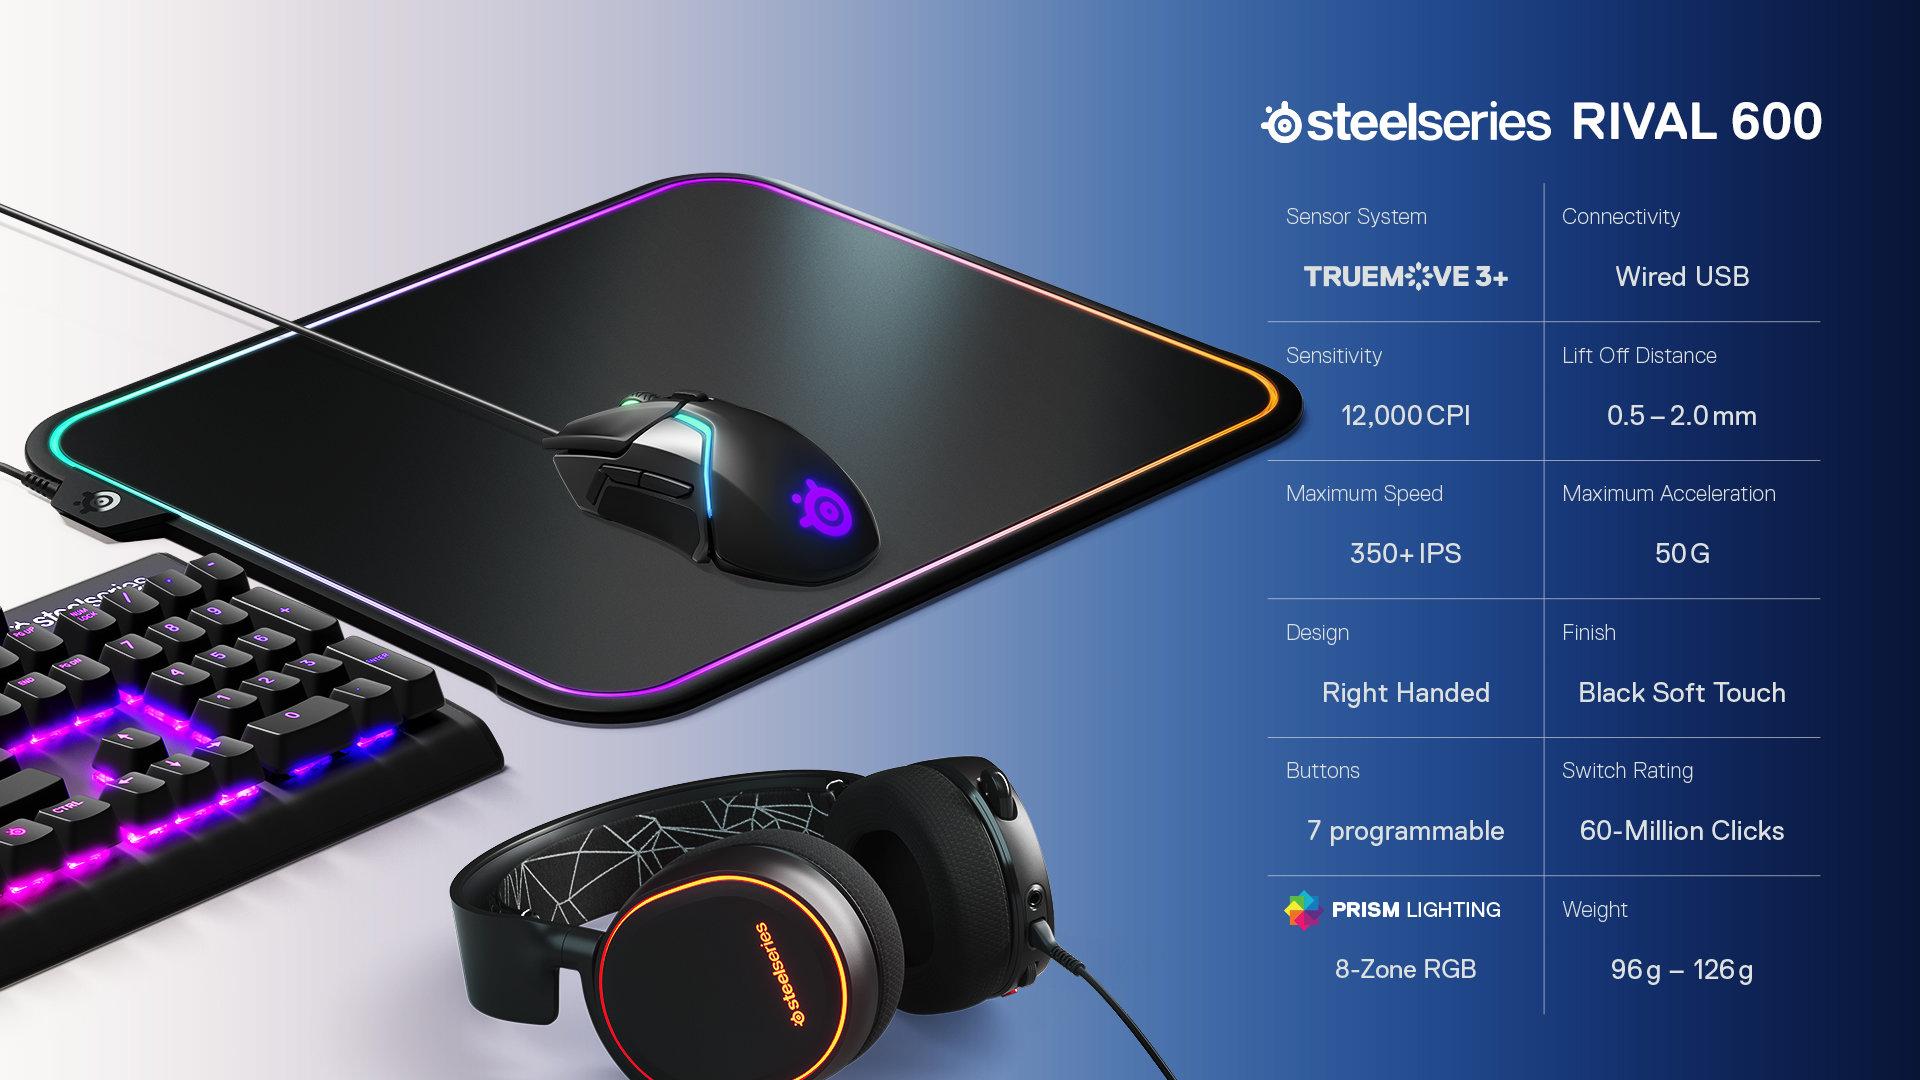 SteelSeries Rival 600